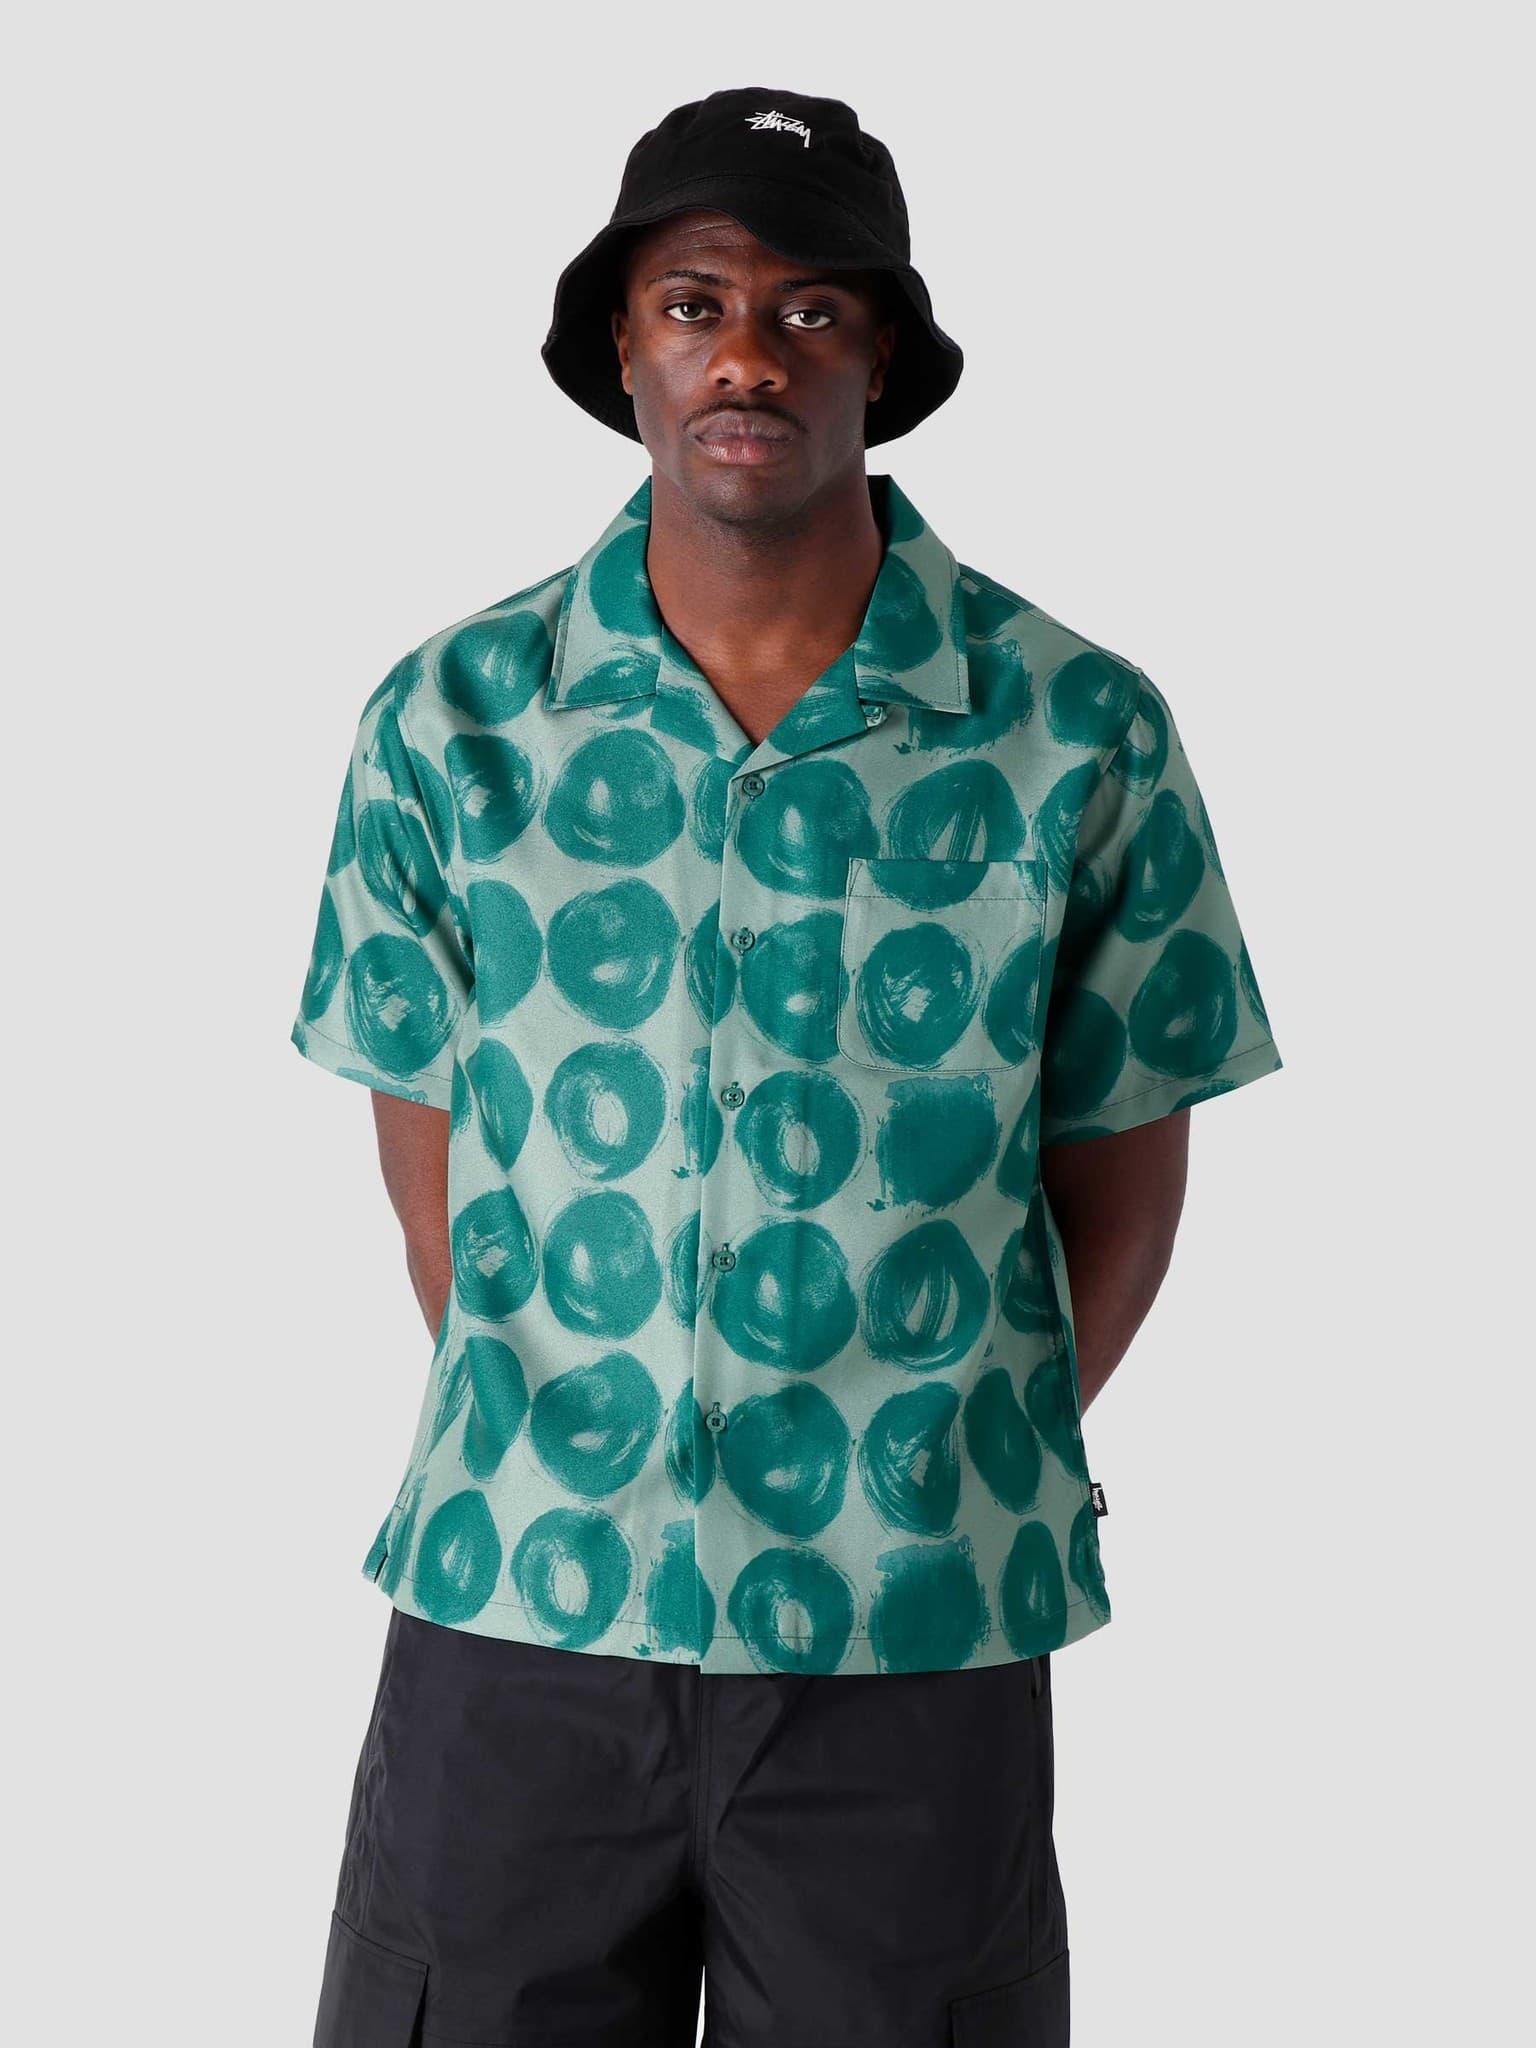 Hand Drawn Dot Shirt Green 1110158-0401